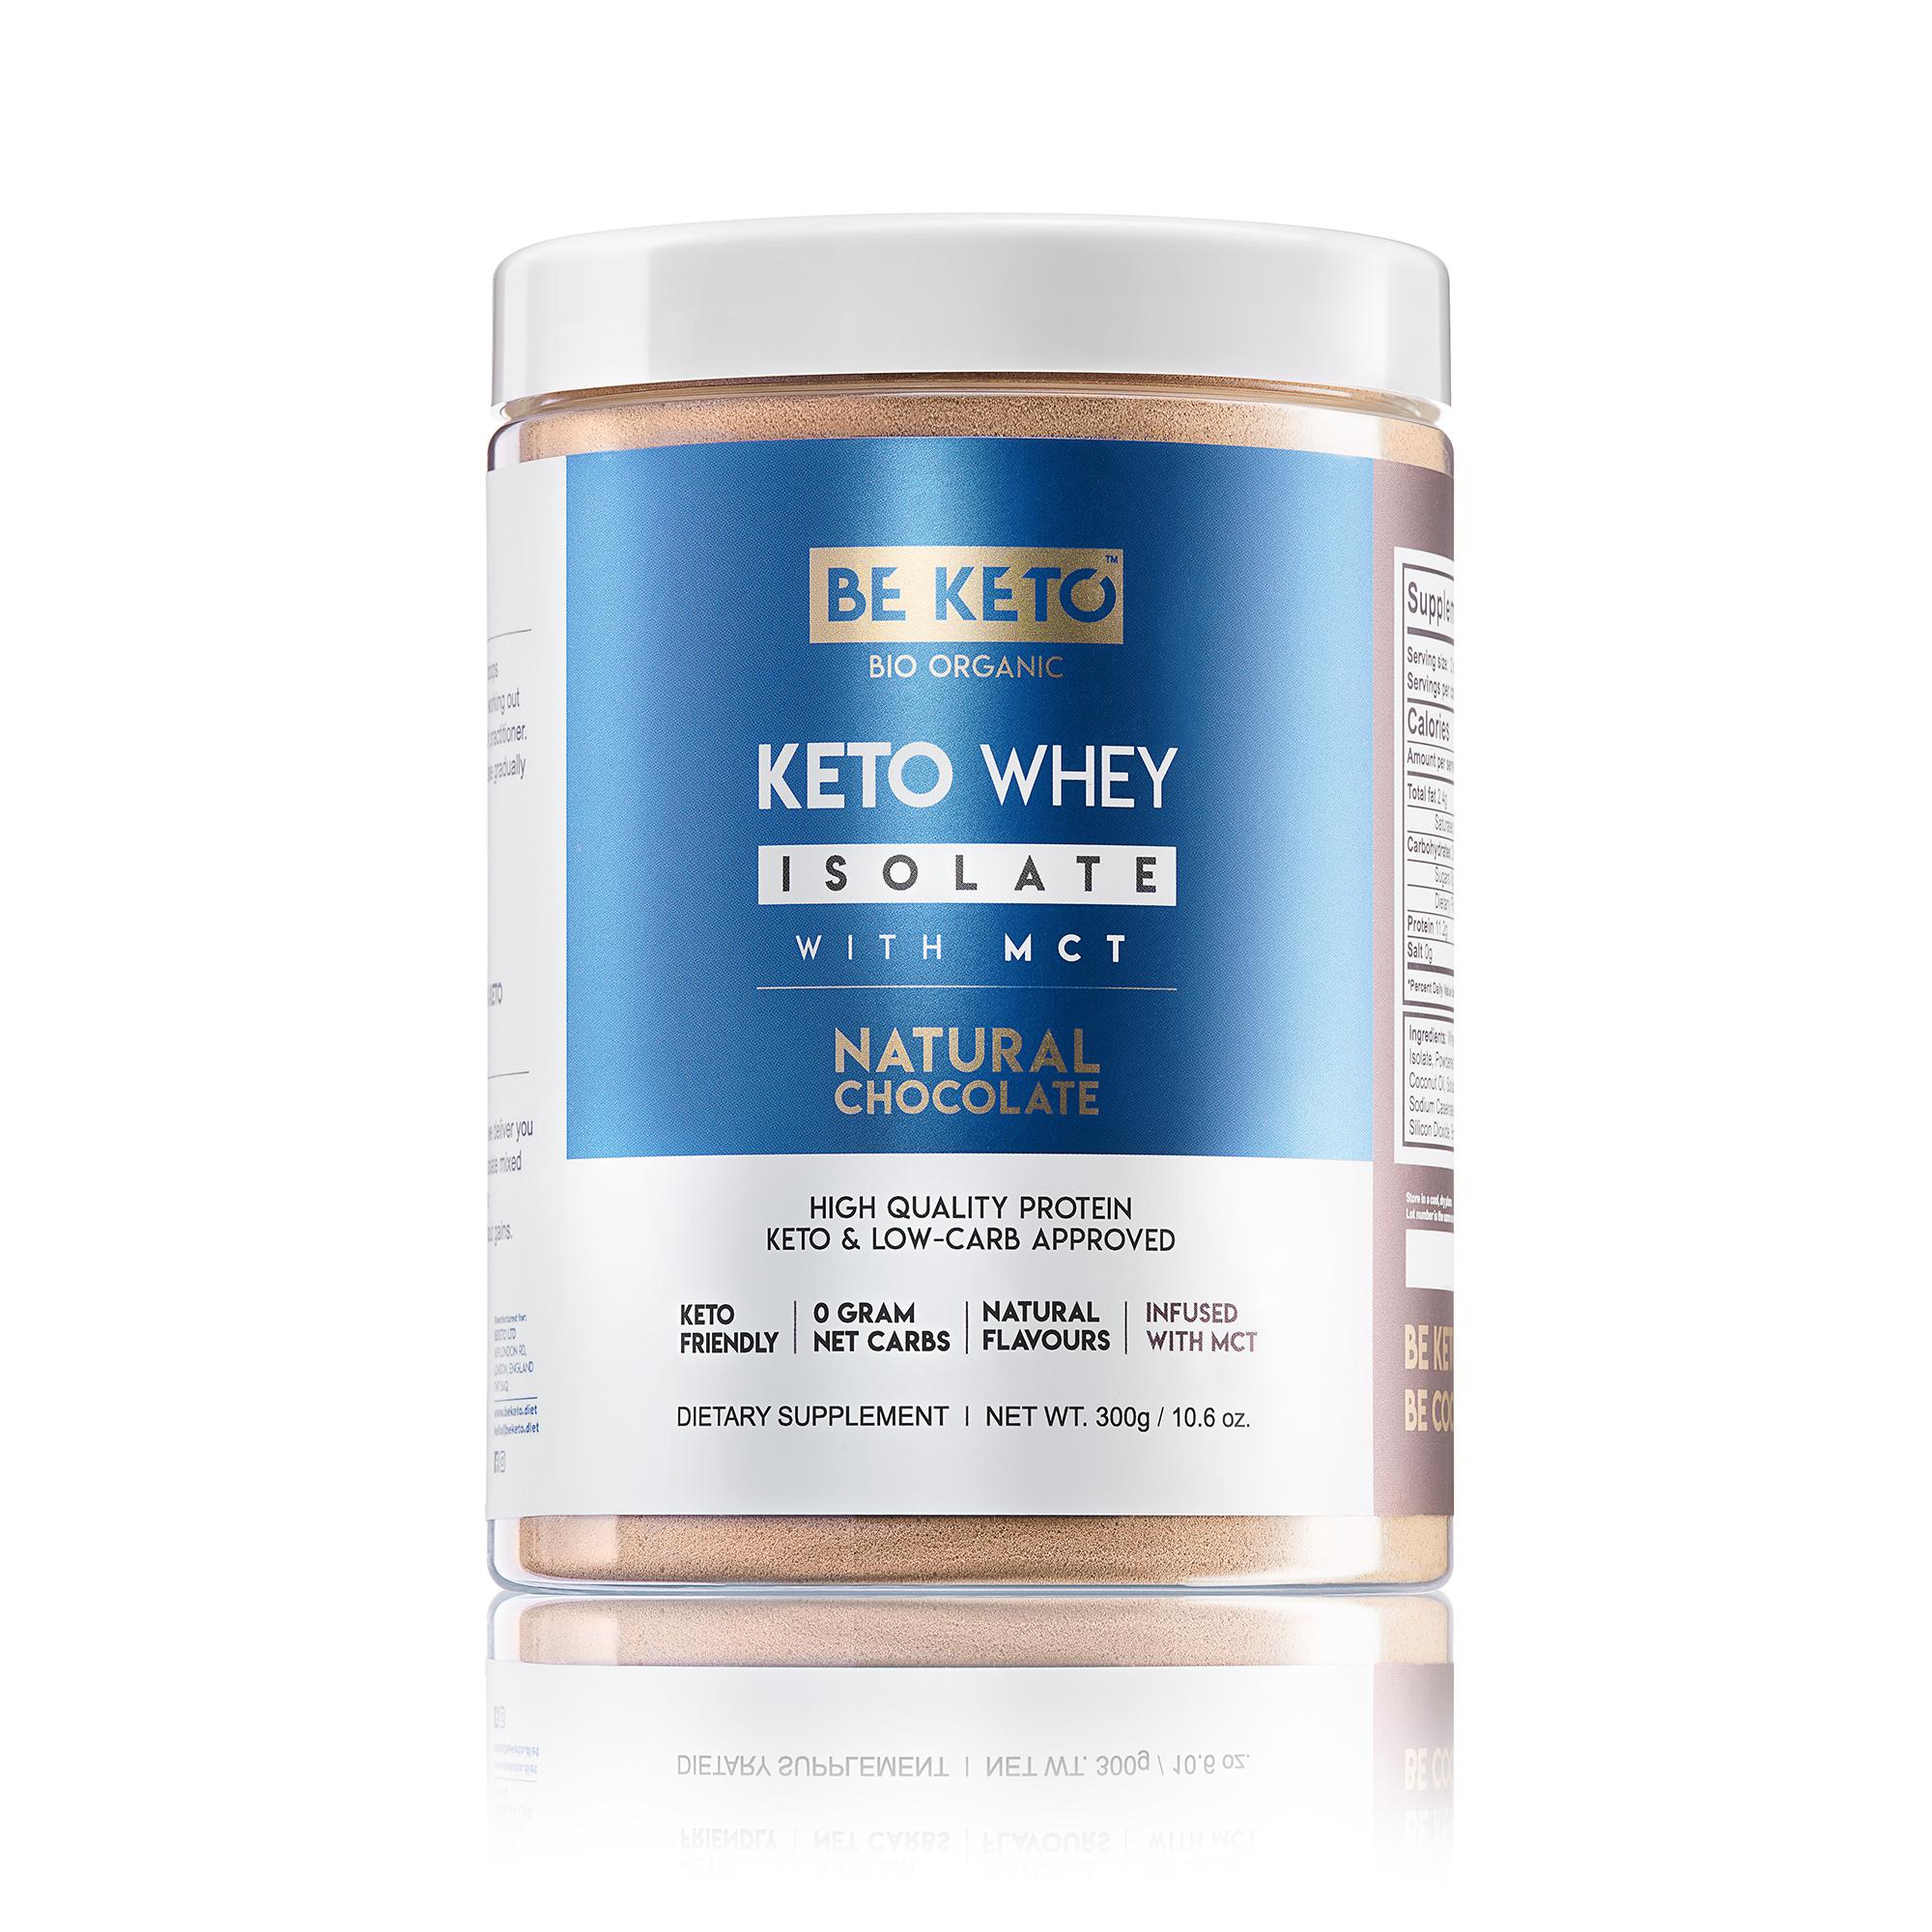 Keto Whey isolate + MCT - Natural Chocolate 300G